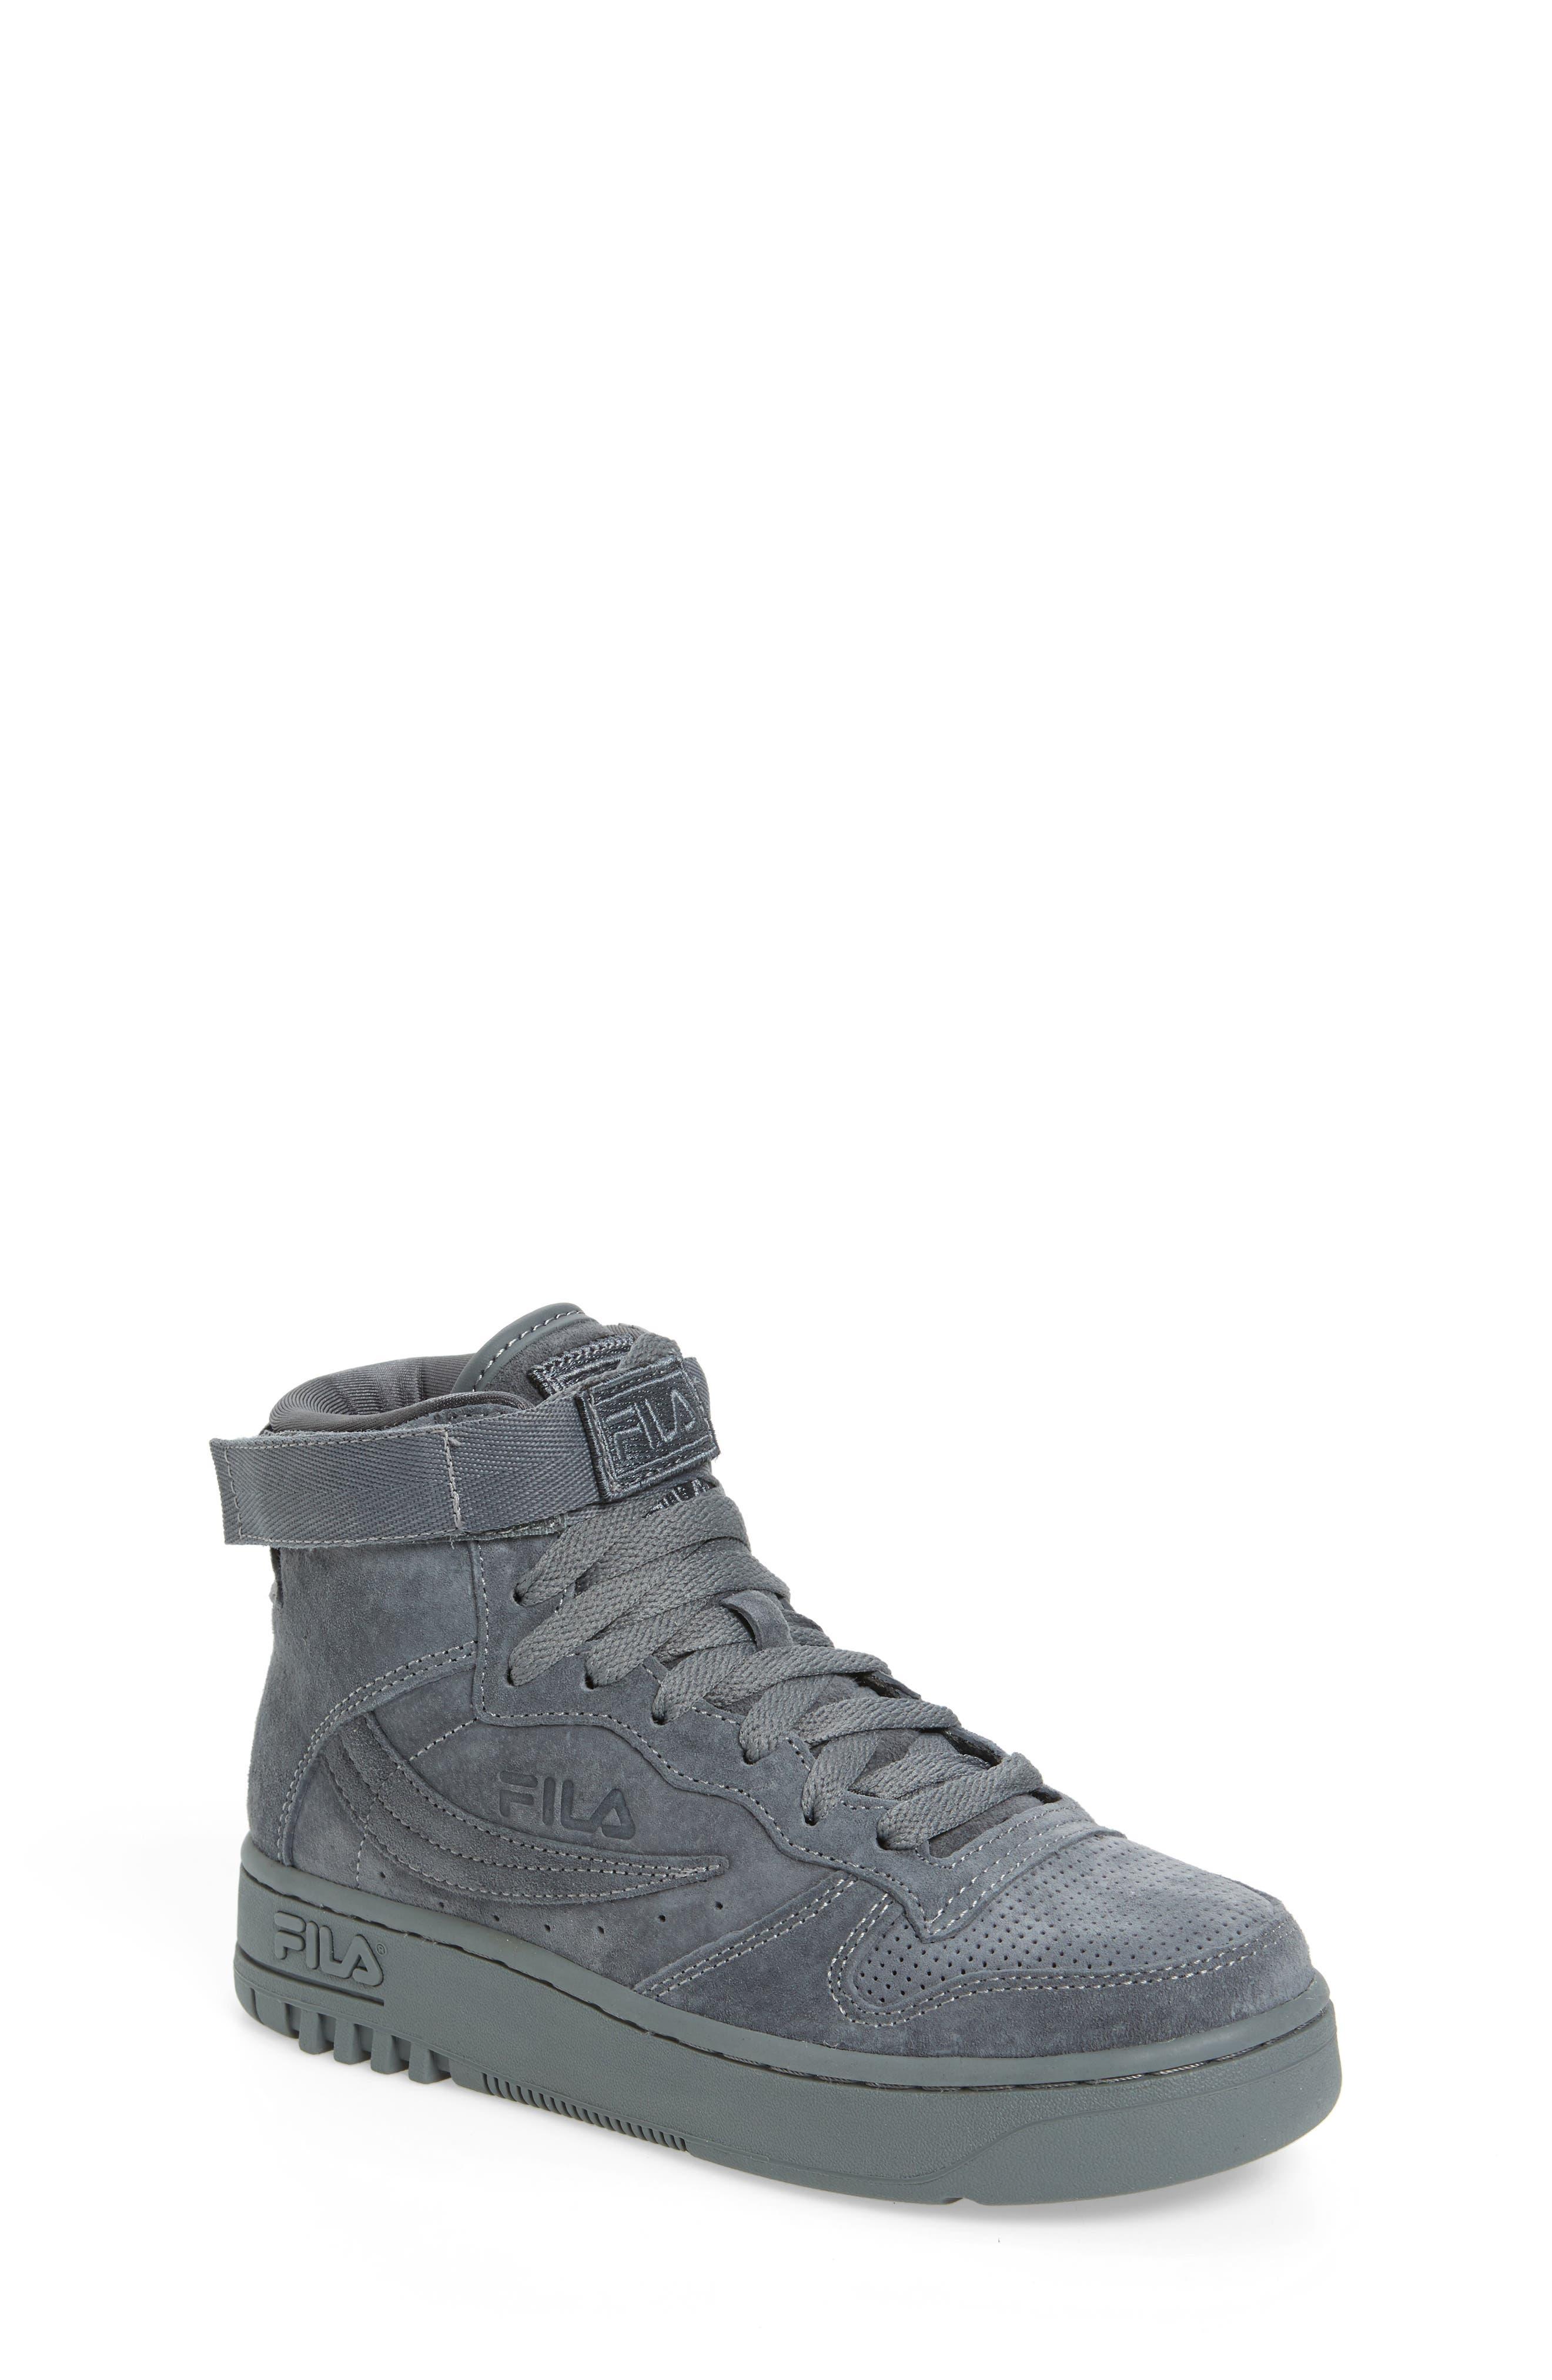 Main Image - Fila USA FX-100 High Top Sneaker (Big Kid)